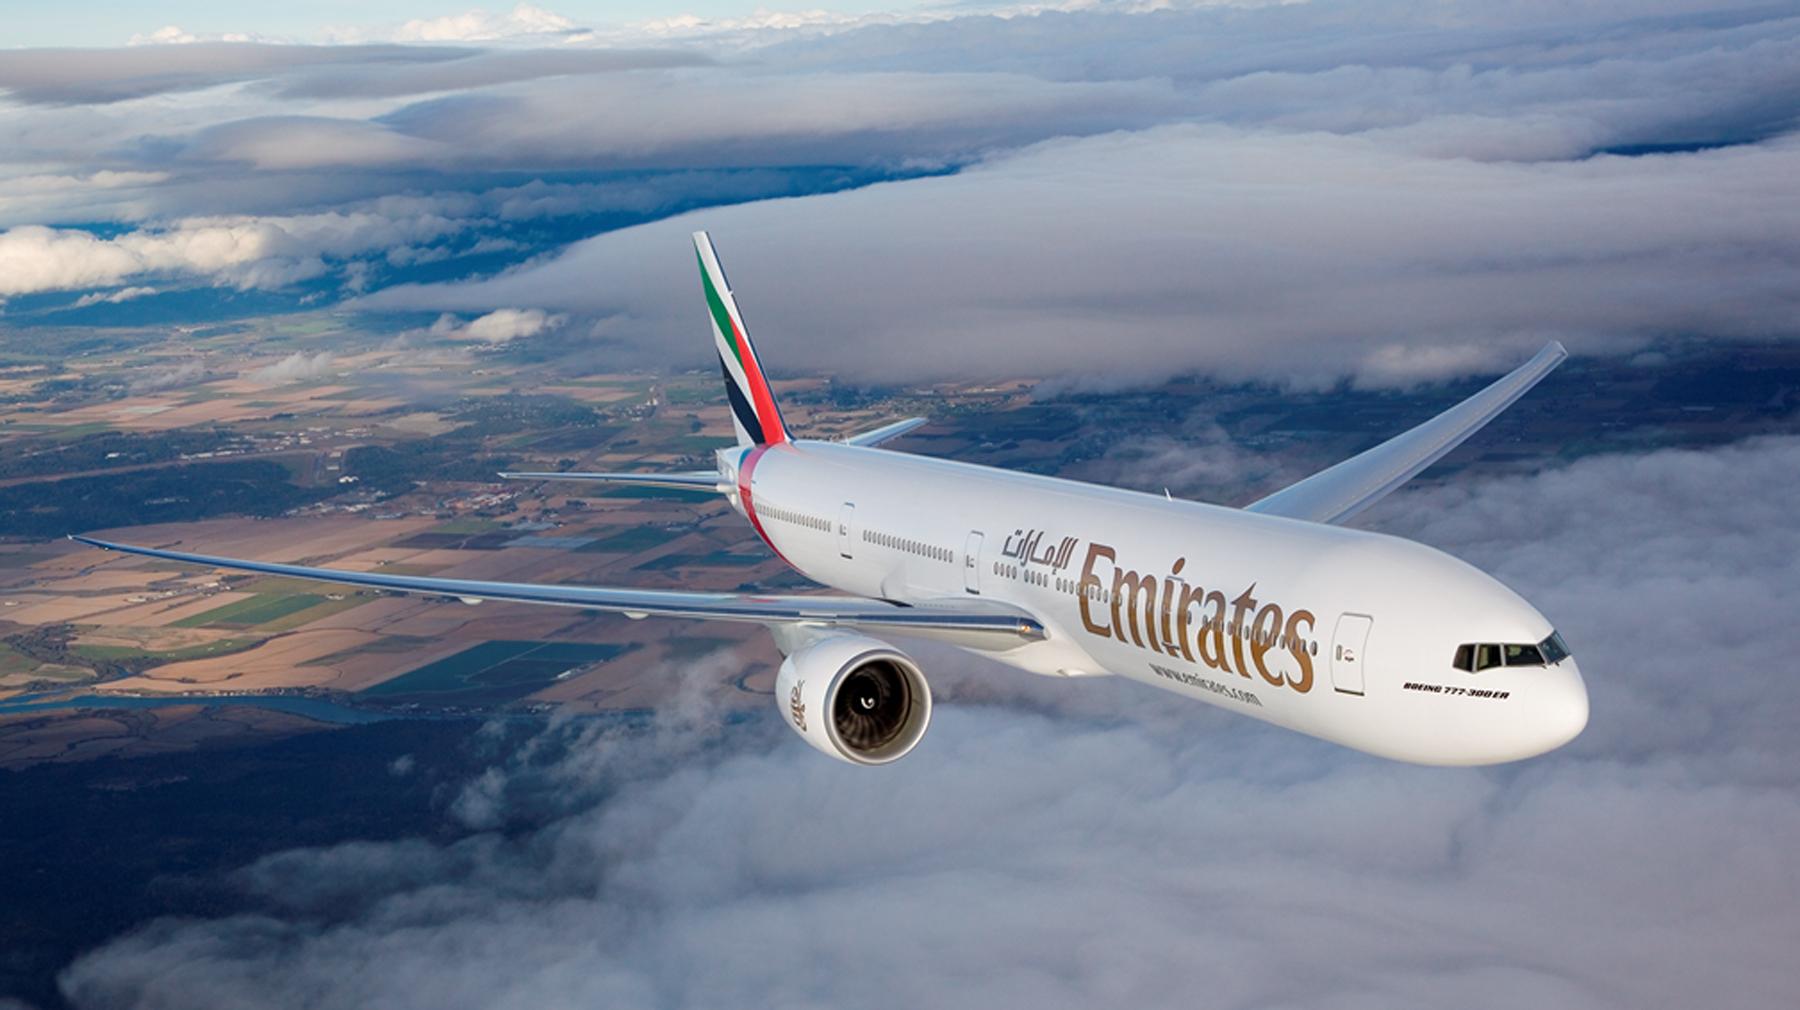 fot. mat. prasowy linii Emirates